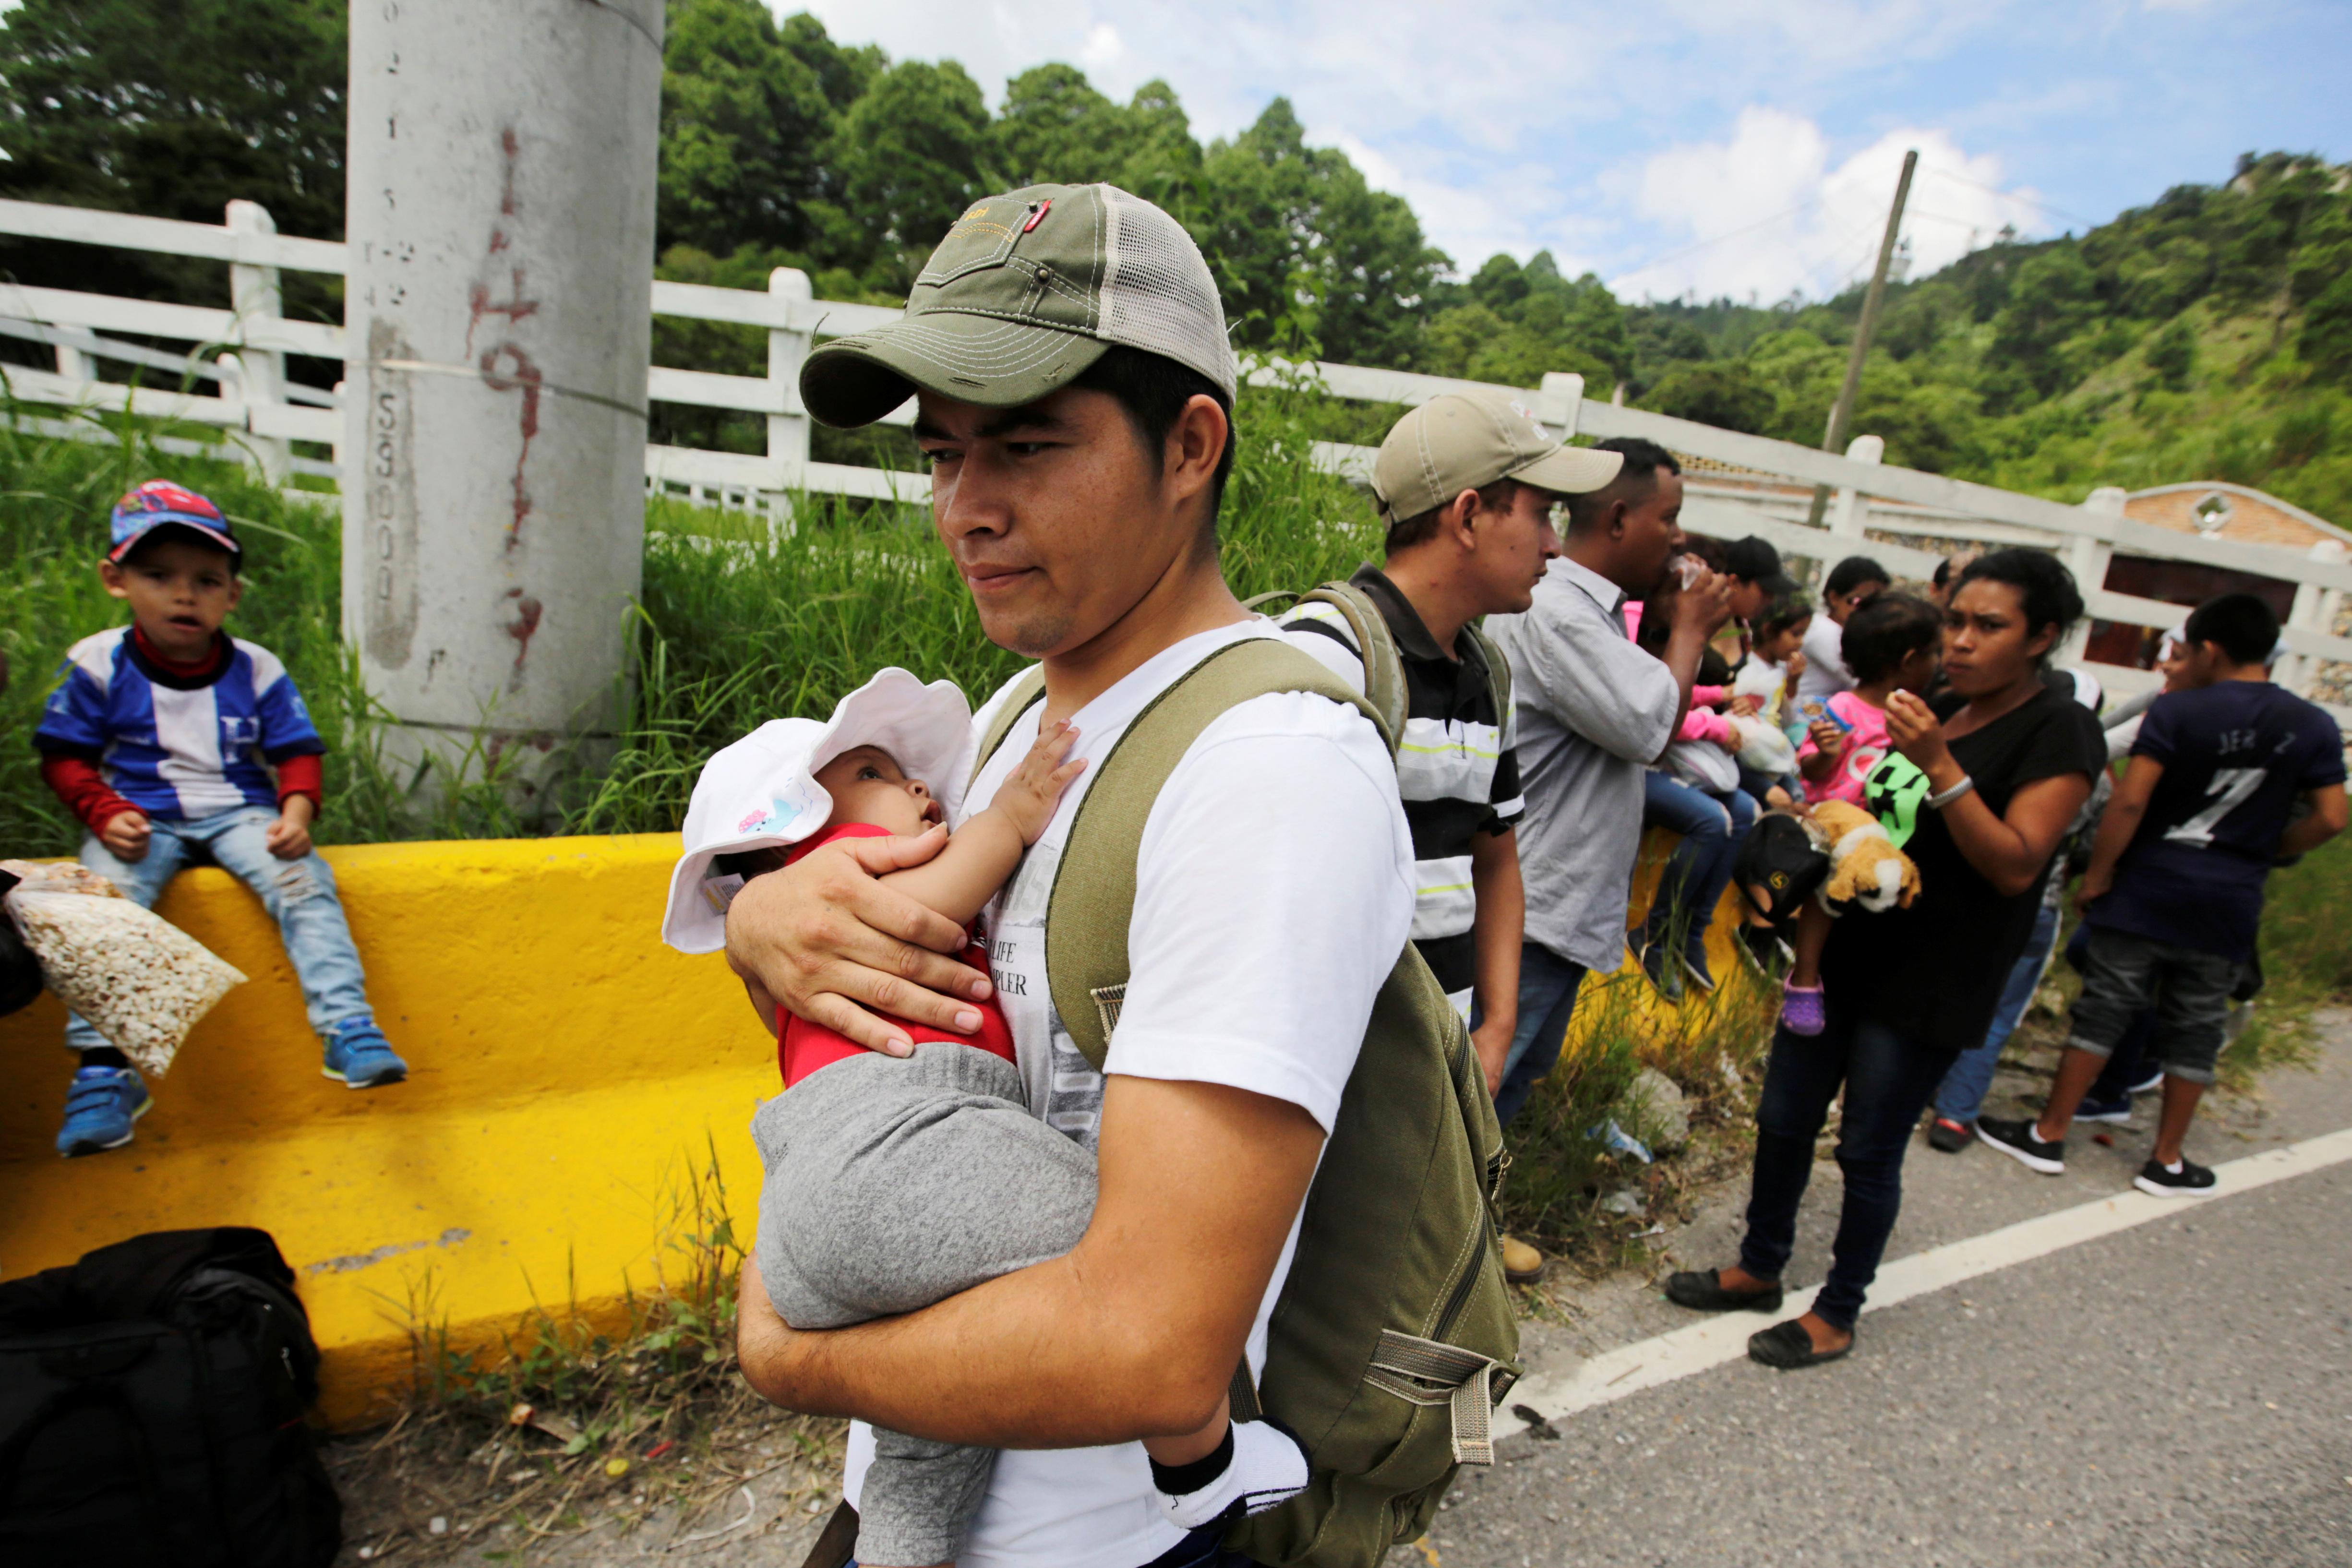 Honduran migrants taking part in a caravan towards the